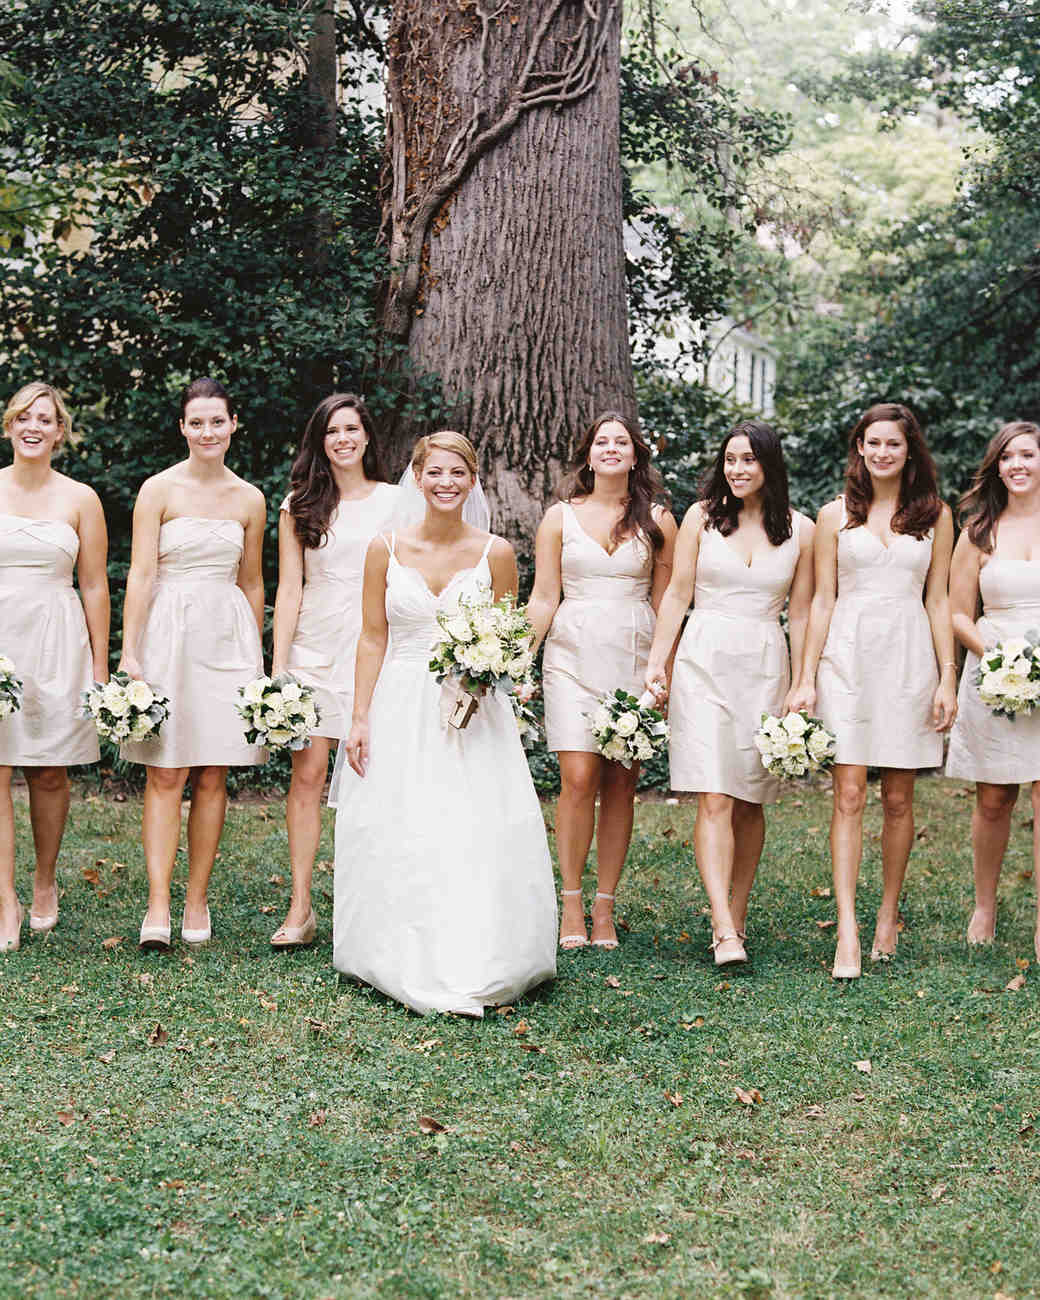 beth-scott-wedding-bridesmaids-0377-s112077-0715.jpg